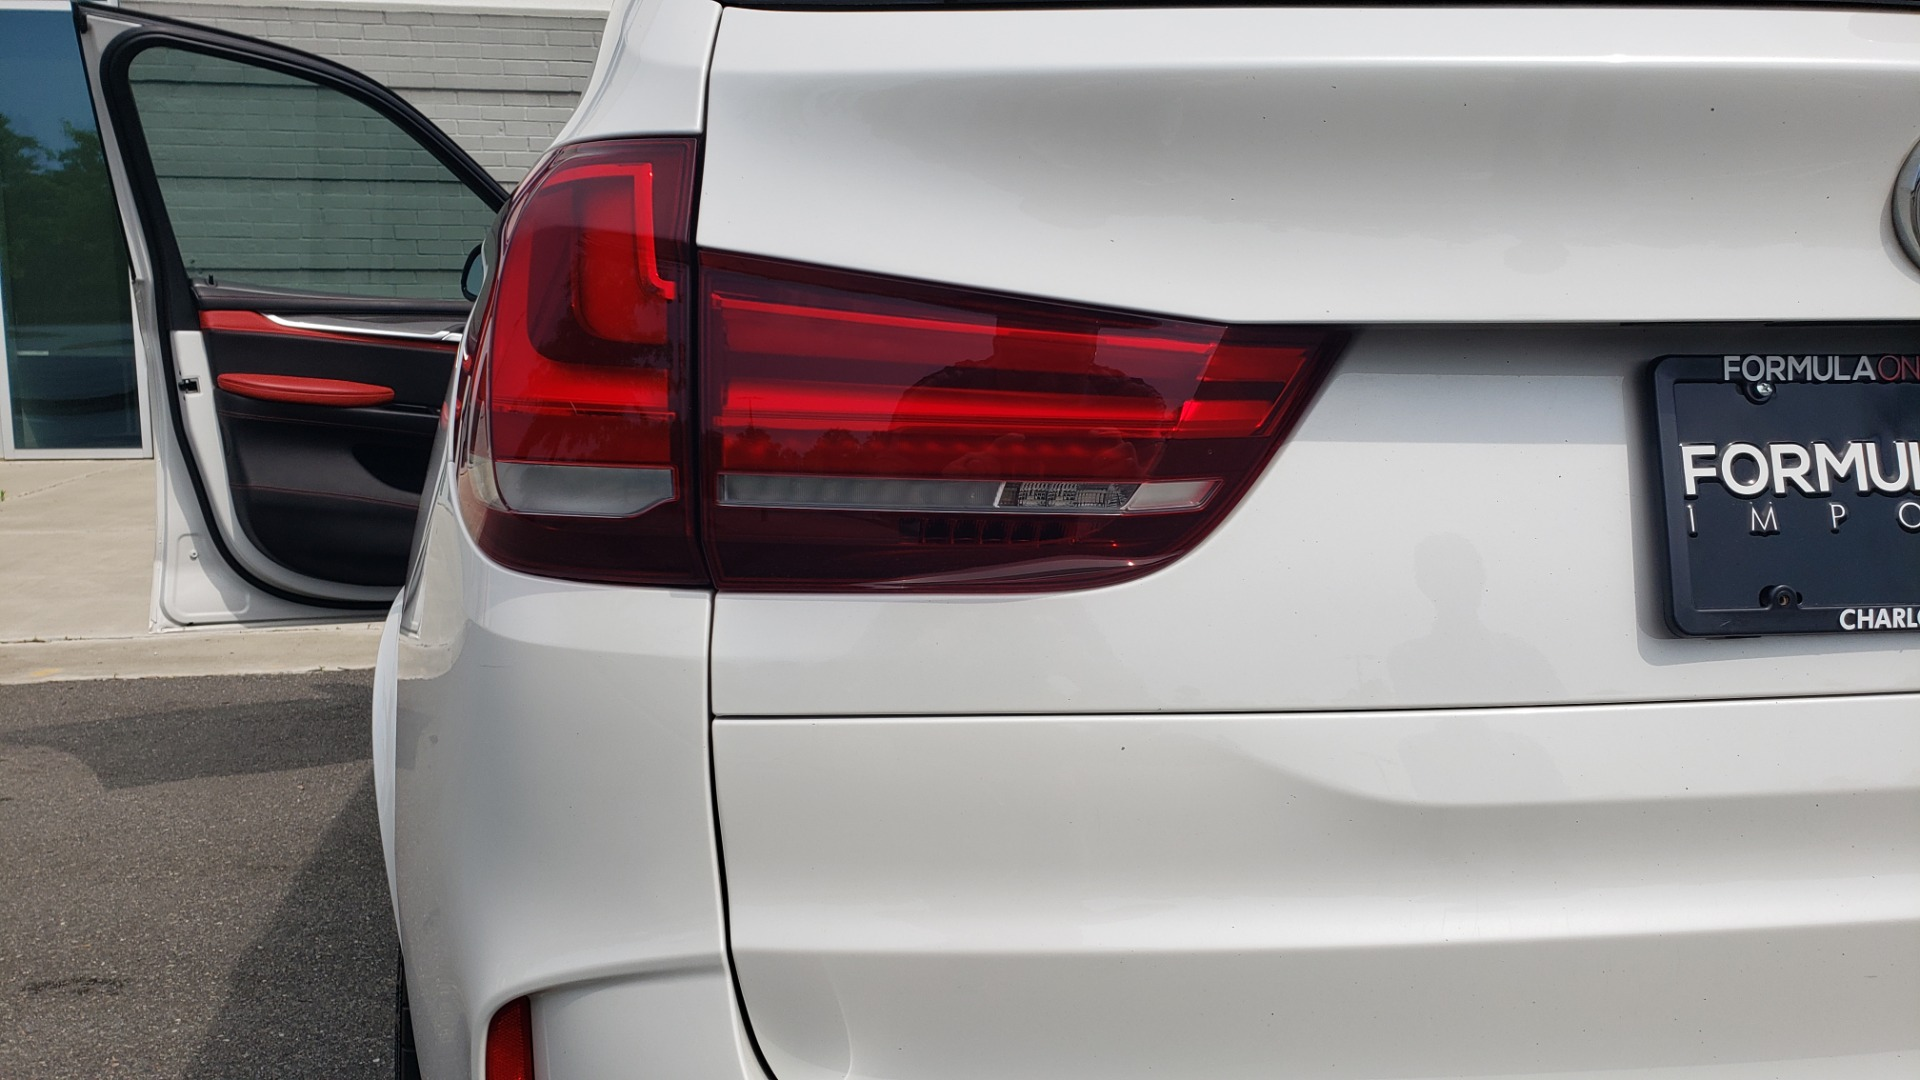 Used 2017 BMW X5 M EXECUTIVE PKG / NAV / DRVR ASST / BSM / HUD / HTD STS / WIFI for sale Sold at Formula Imports in Charlotte NC 28227 29